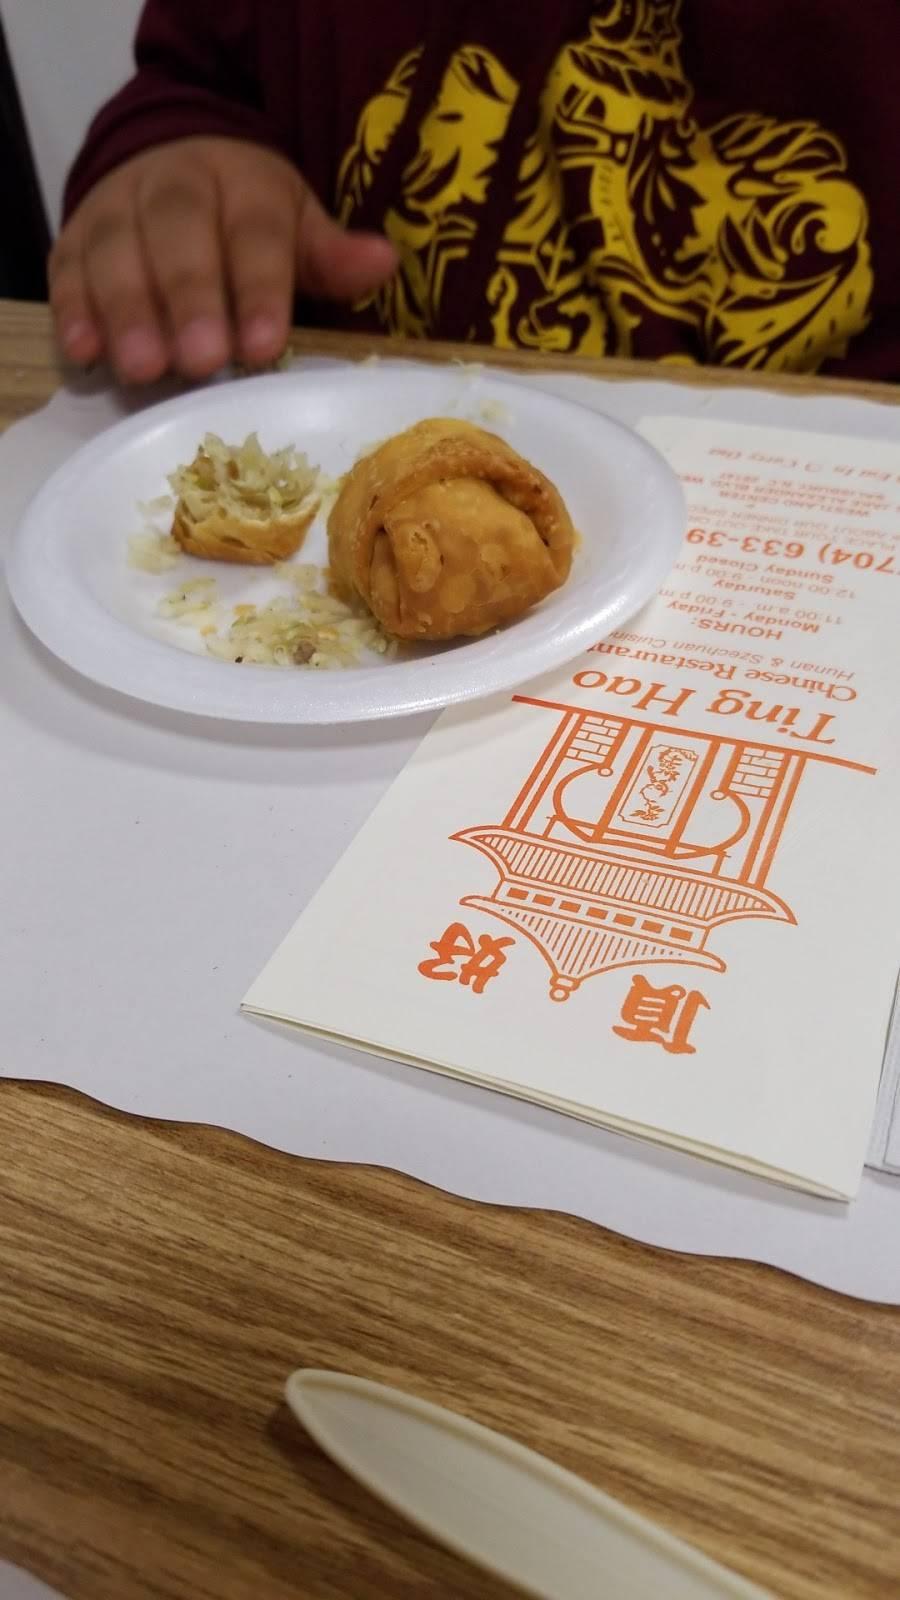 Ting Hao Chinese Restaurant | restaurant | 519 Jake Alexander Blvd W # G, Salisbury, NC 28147, USA | 7046333942 OR +1 704-633-3942